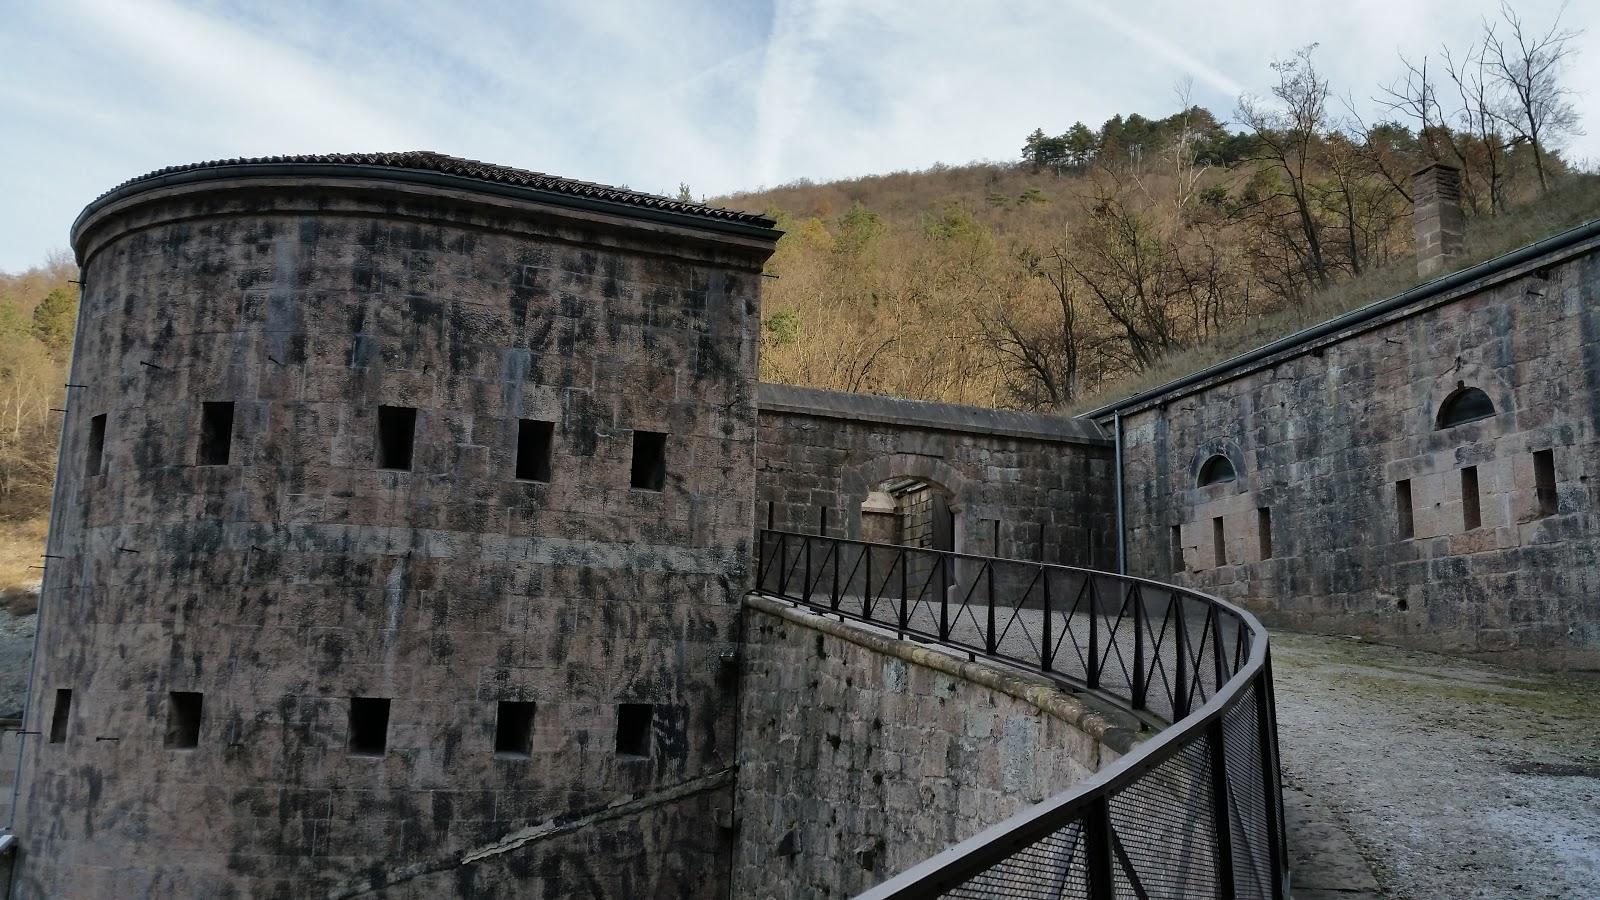 tridentum trento sotterranea - photo#19